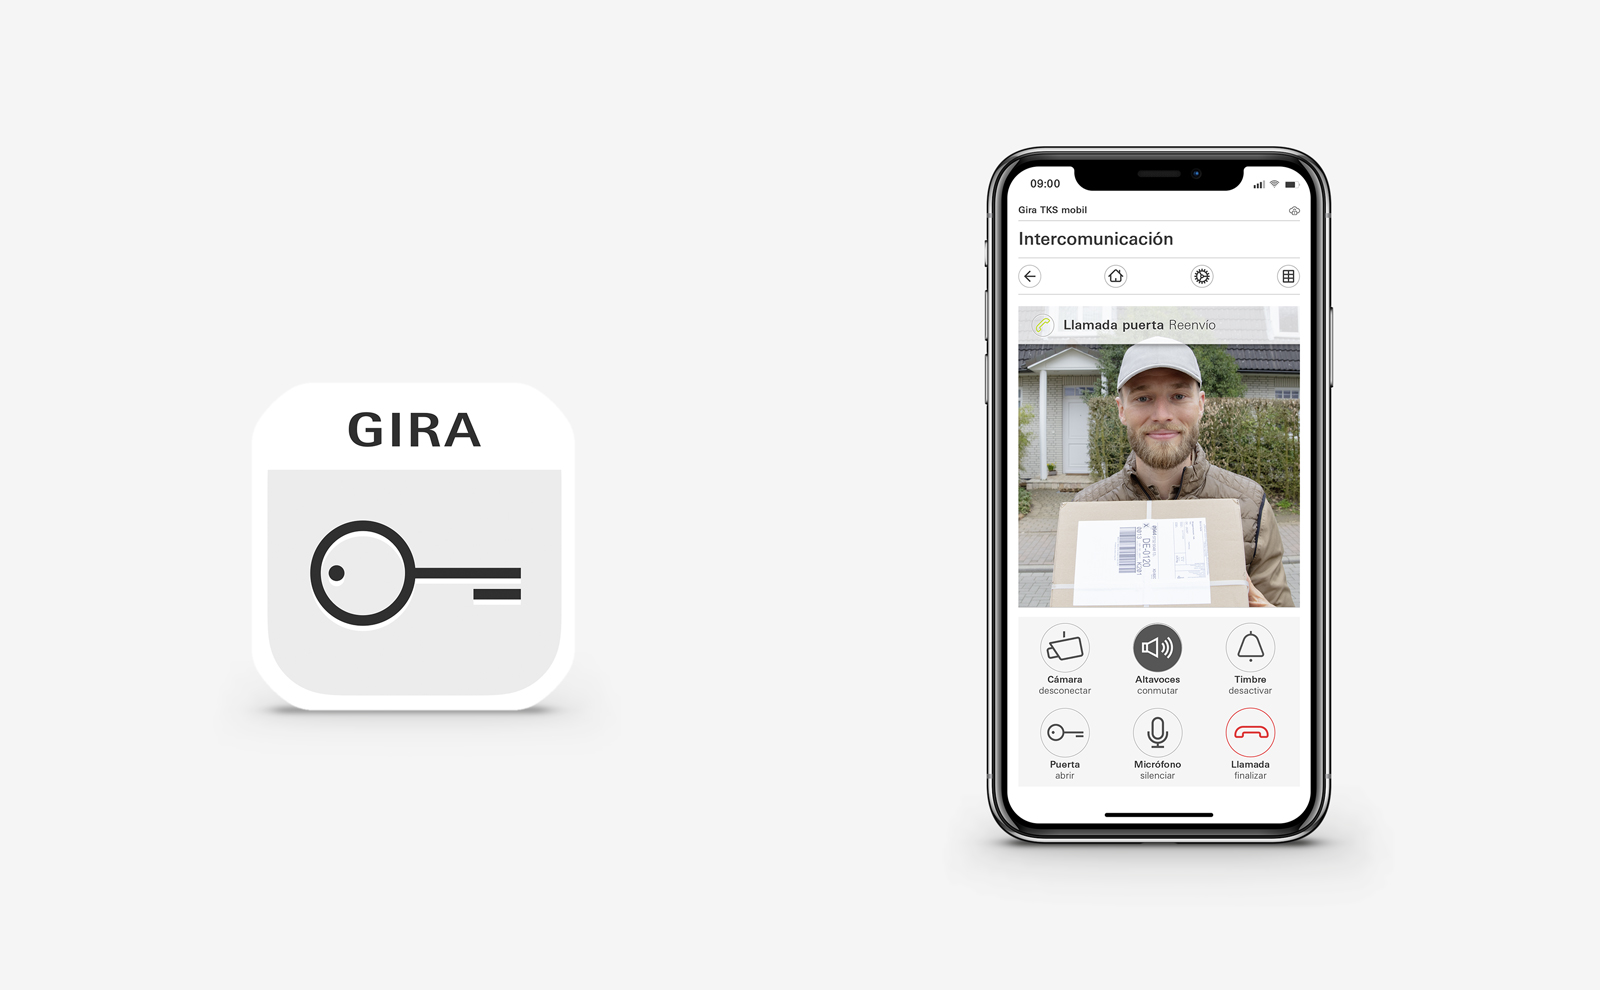 Smartphone mit Interface Tks mobil App